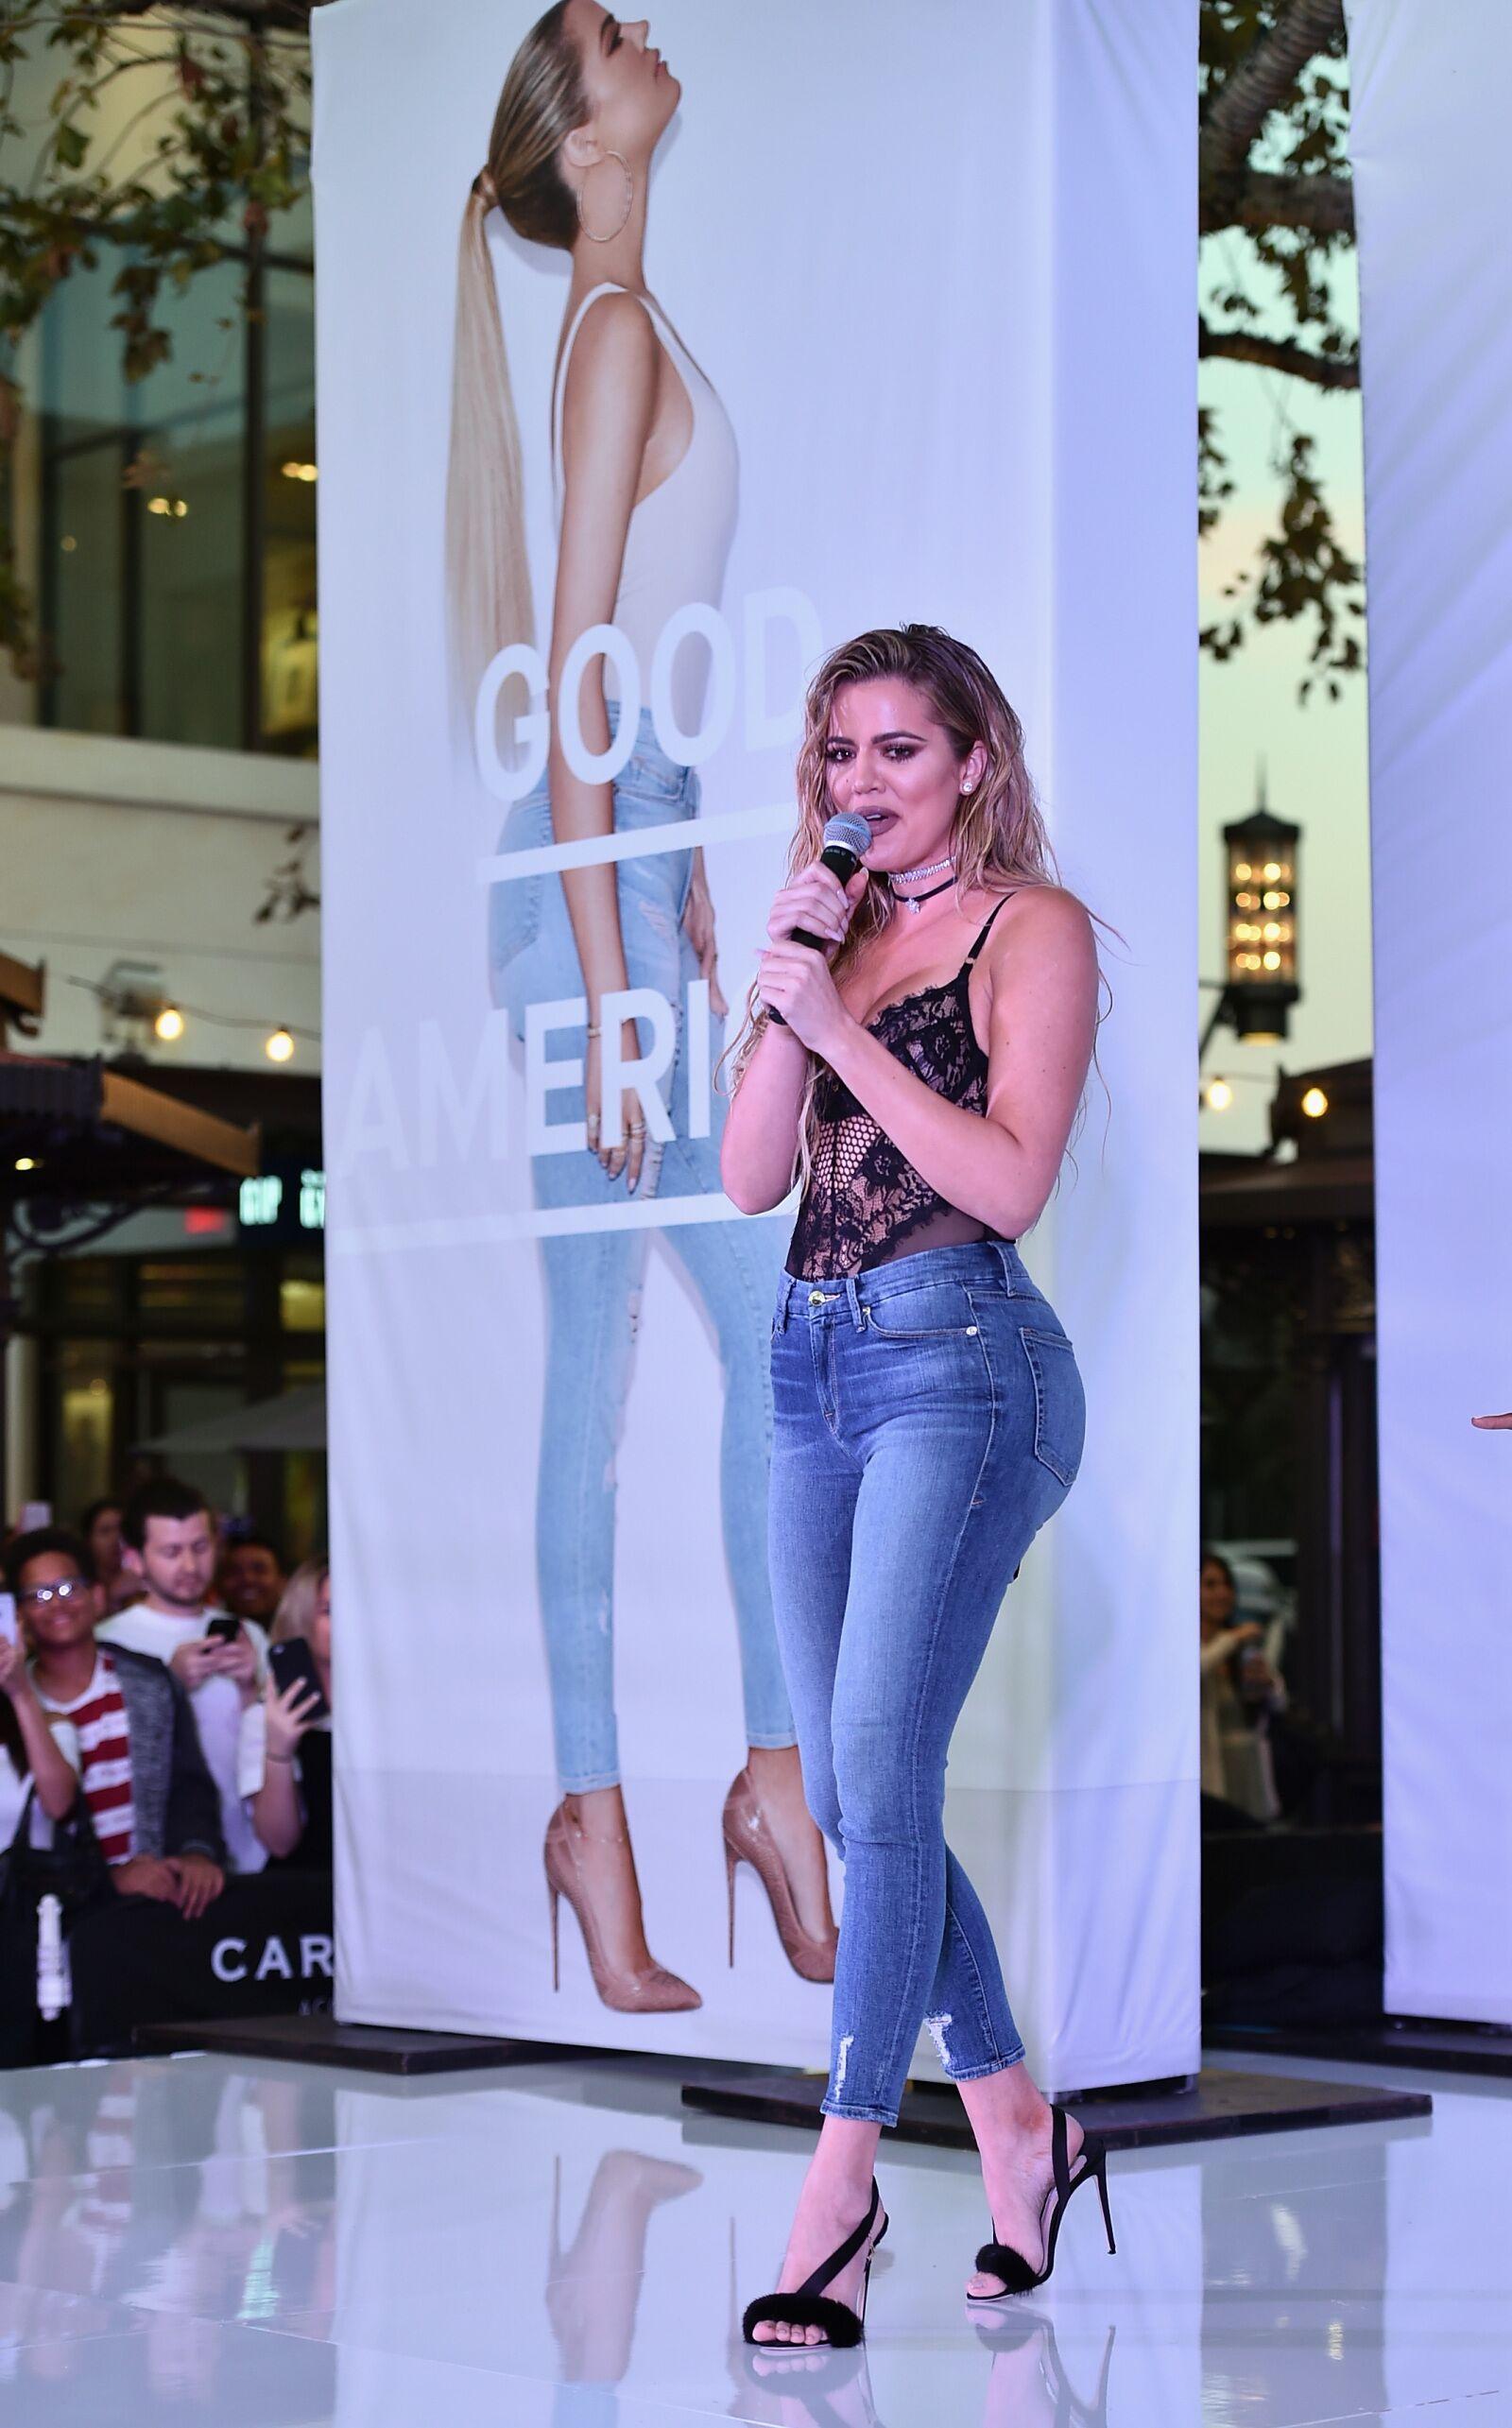 Khloe Kardashian slays in Good American leopard print bra and shorts pic 242c05630